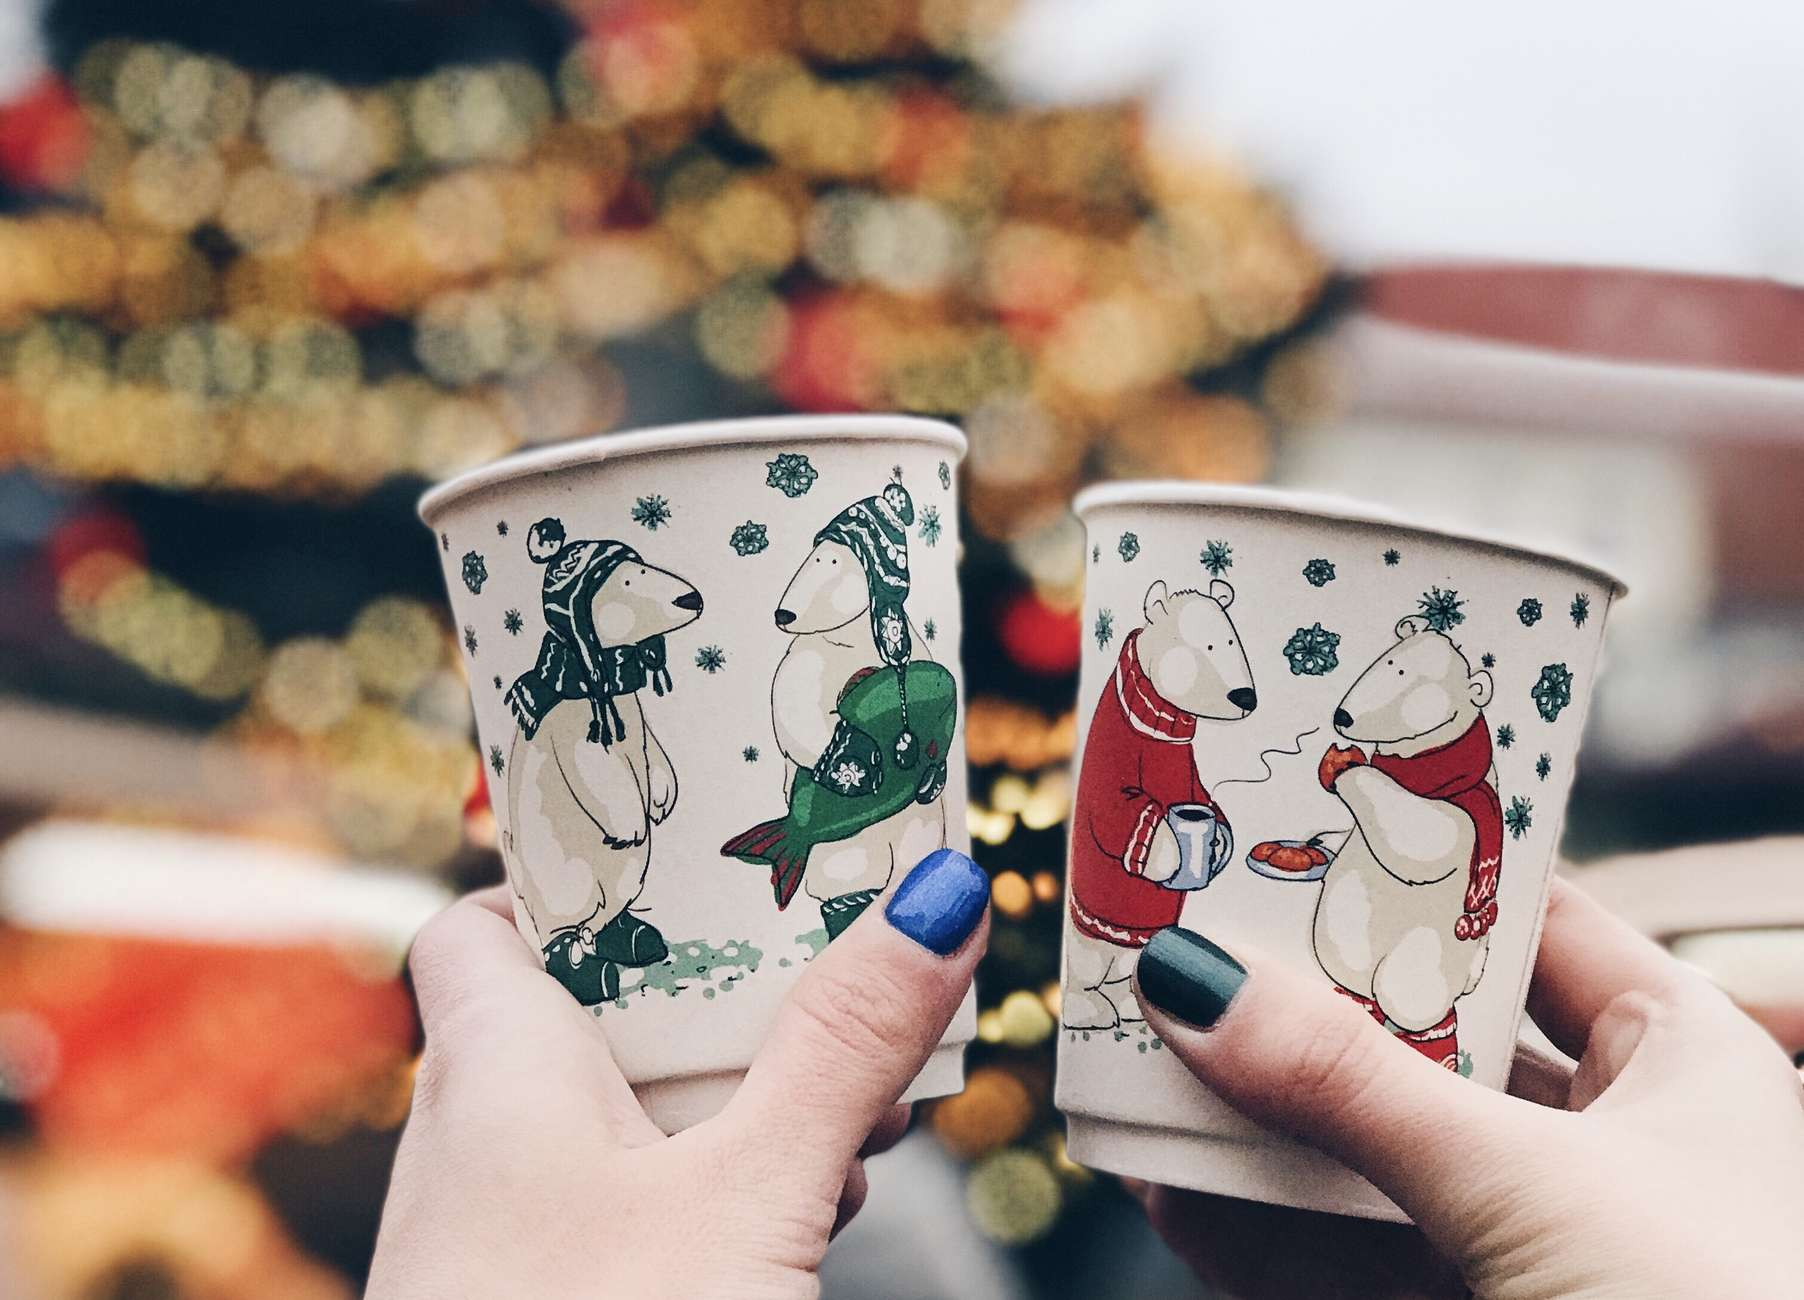 Mulled wine cups at Tallinn Christmas Market. Photo by: Kadi-Liis Koppel